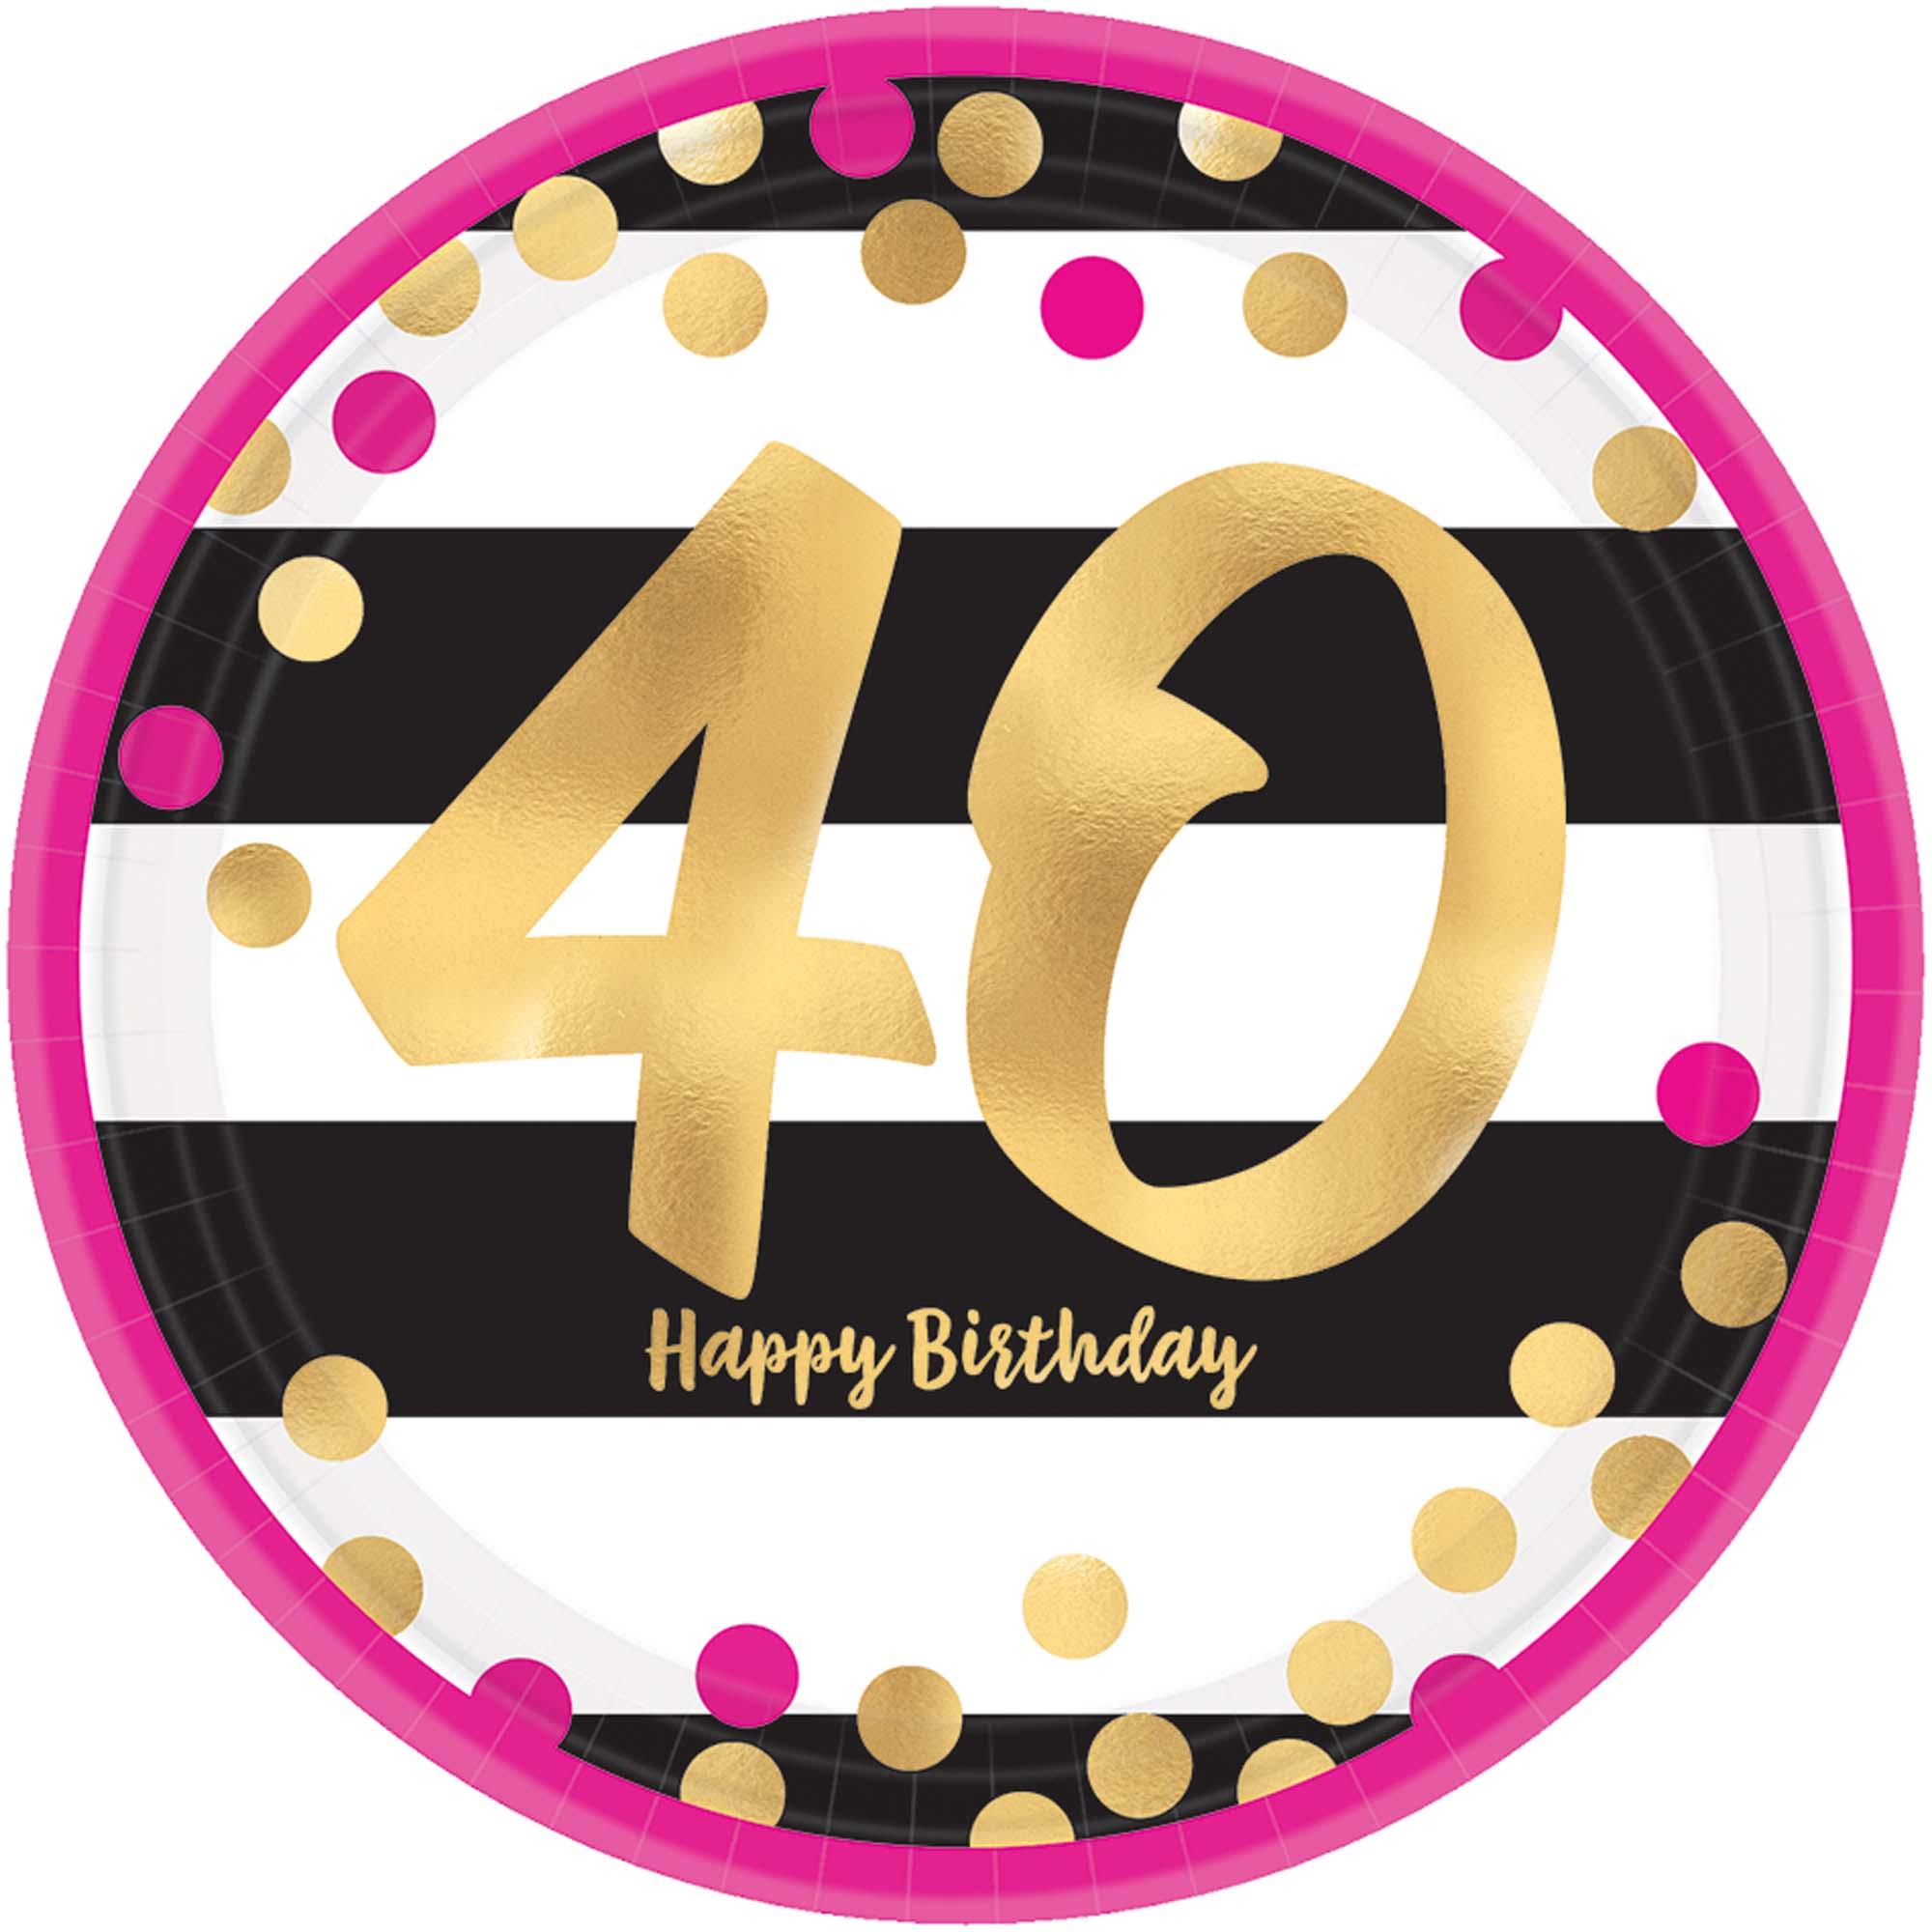 hight resolution of 40th birthday pink gold metallic dessert plates 8 pk